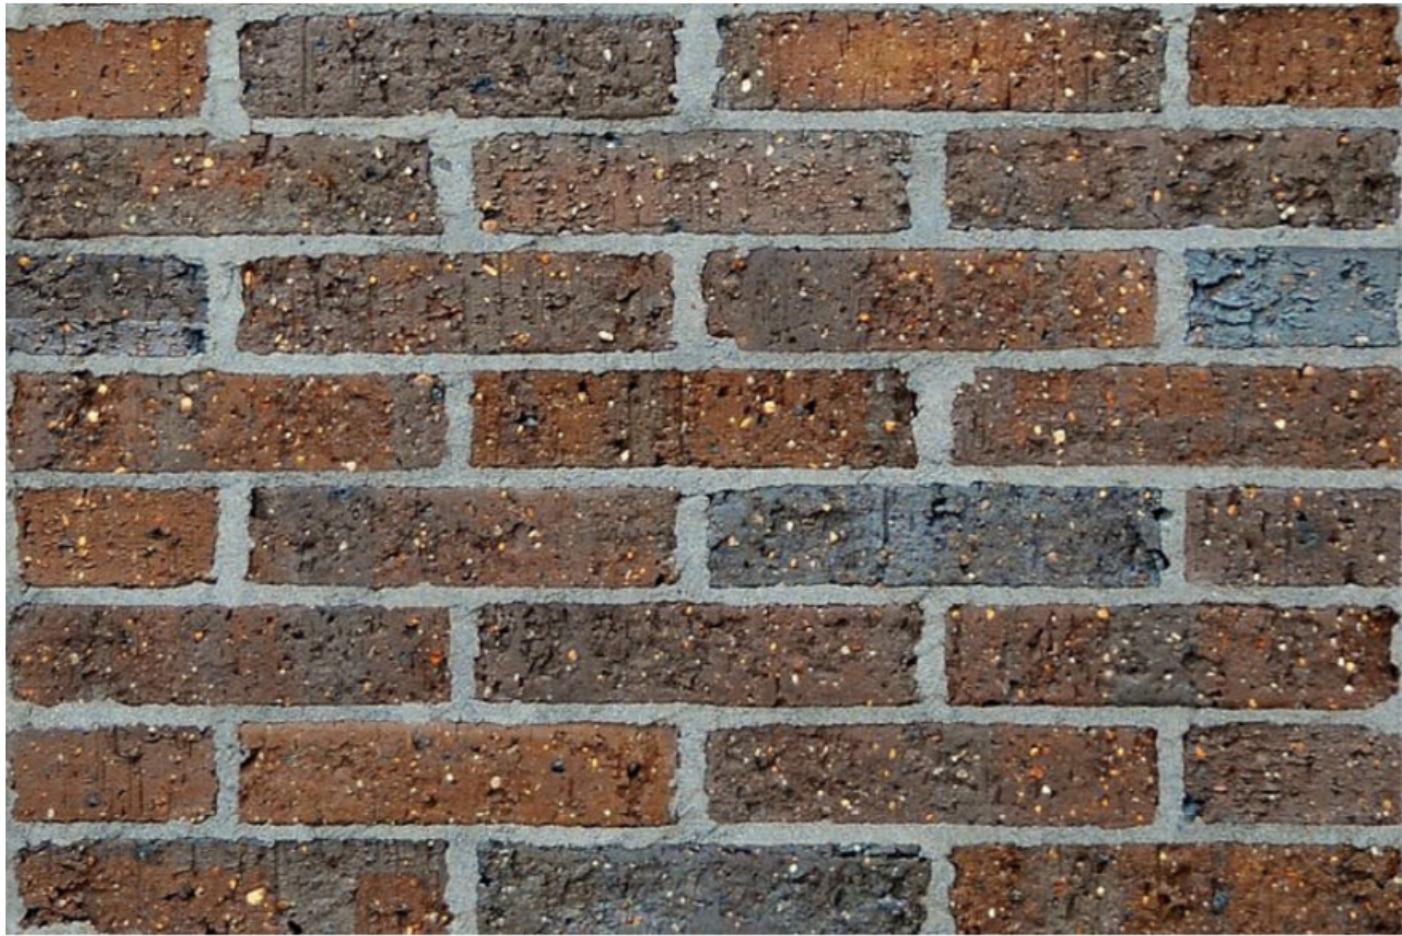 50mm bricks / Bursaria